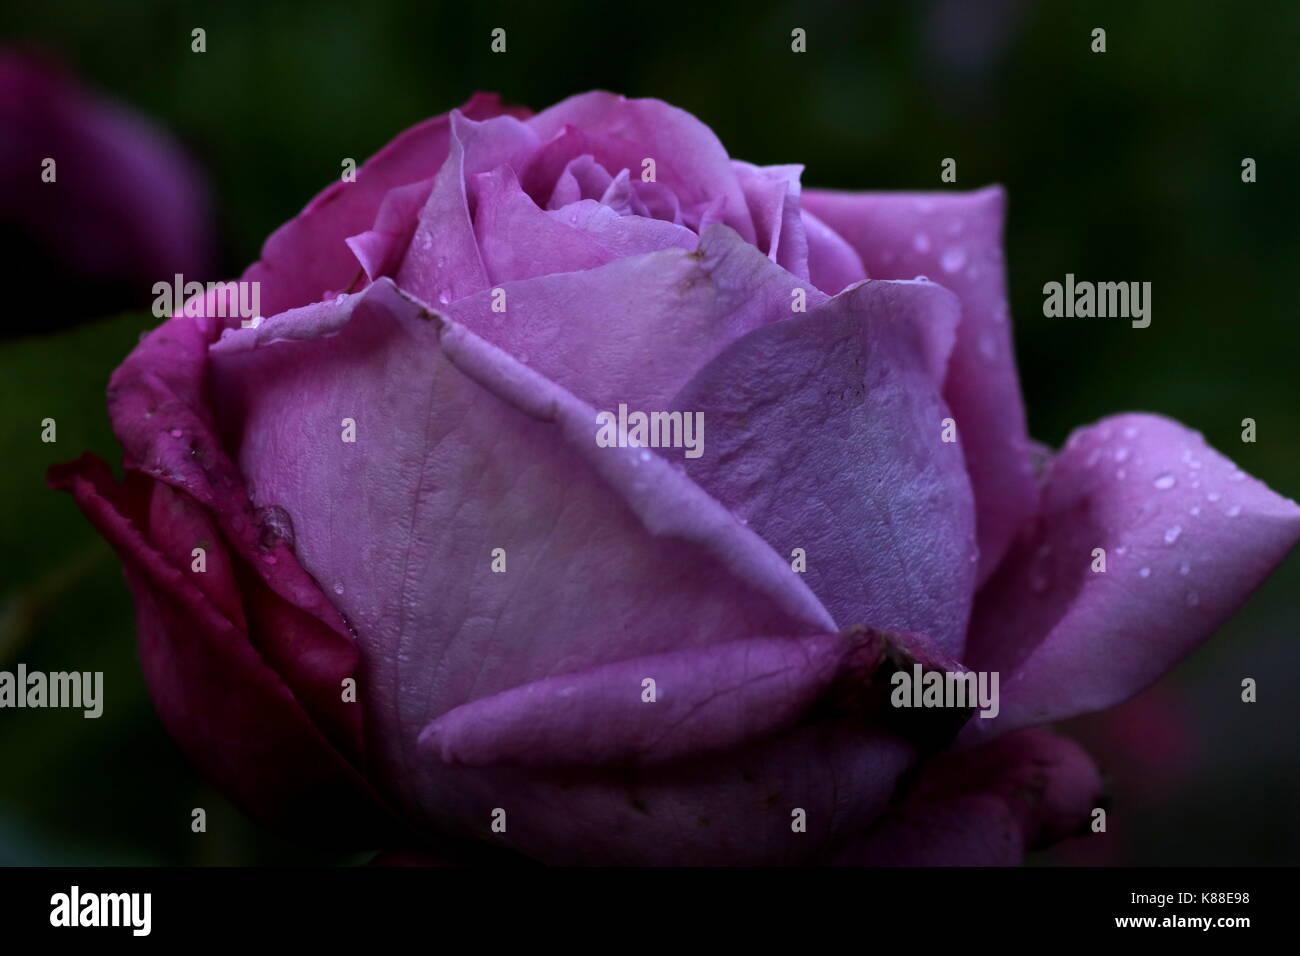 'Lila Wunder' rose flower - Stock Image